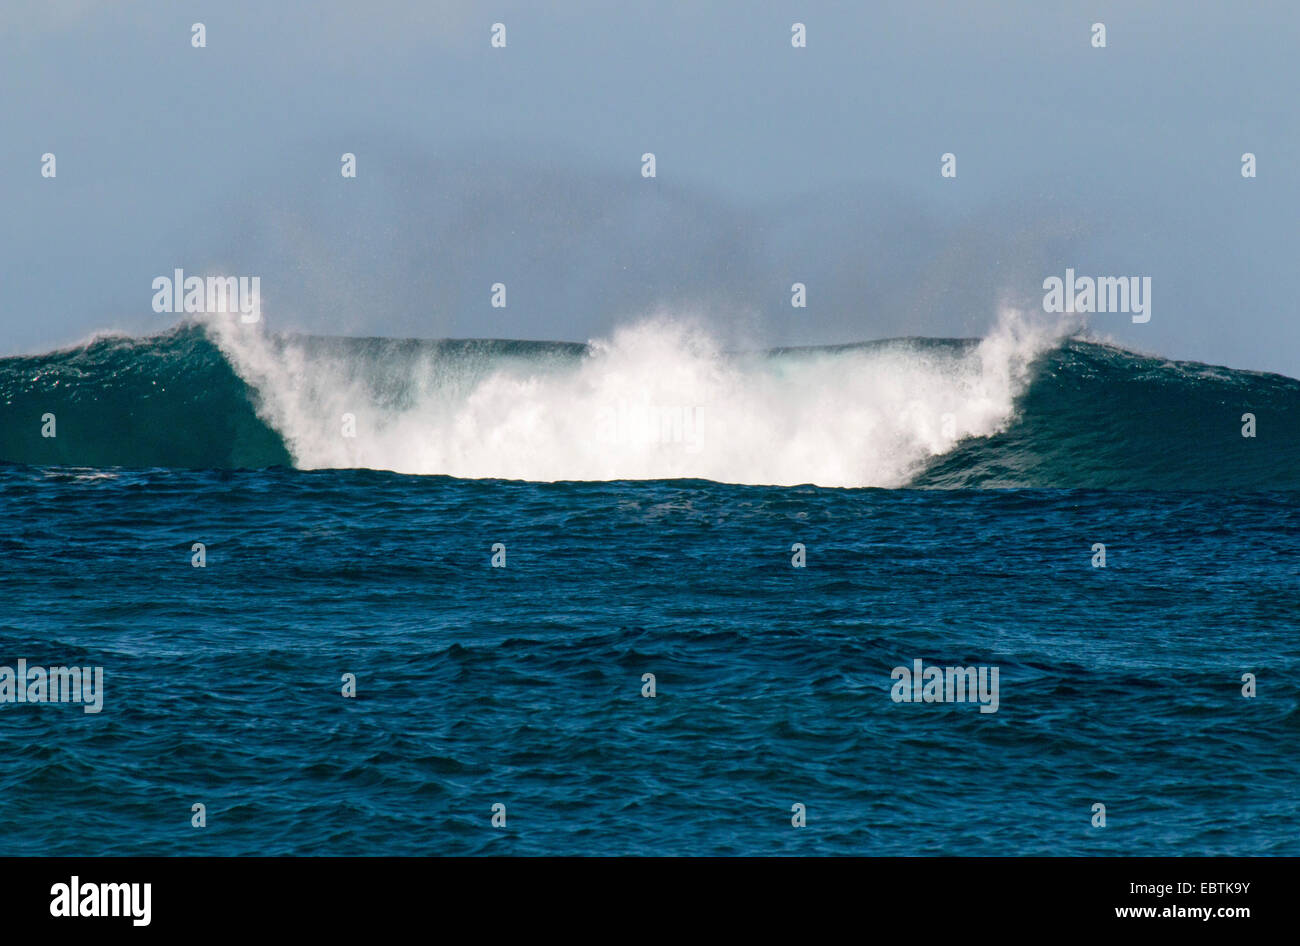 breaking wave of the Indian Ocean, Australia, Western Australia, Port Gregory - Stock Image